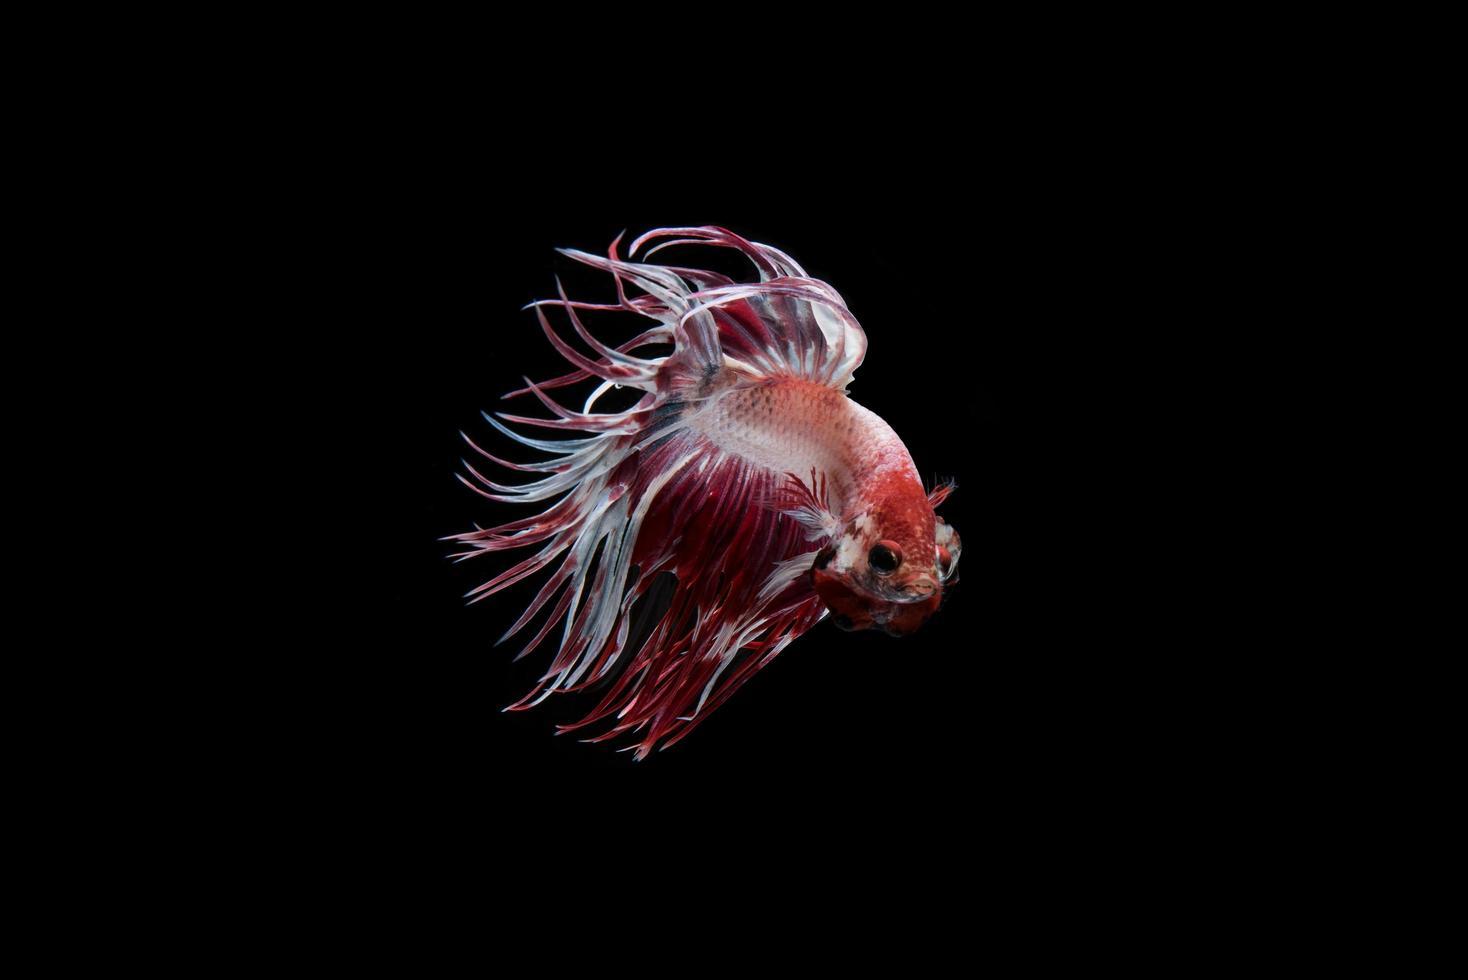 Beau poisson betta siamois coloré photo